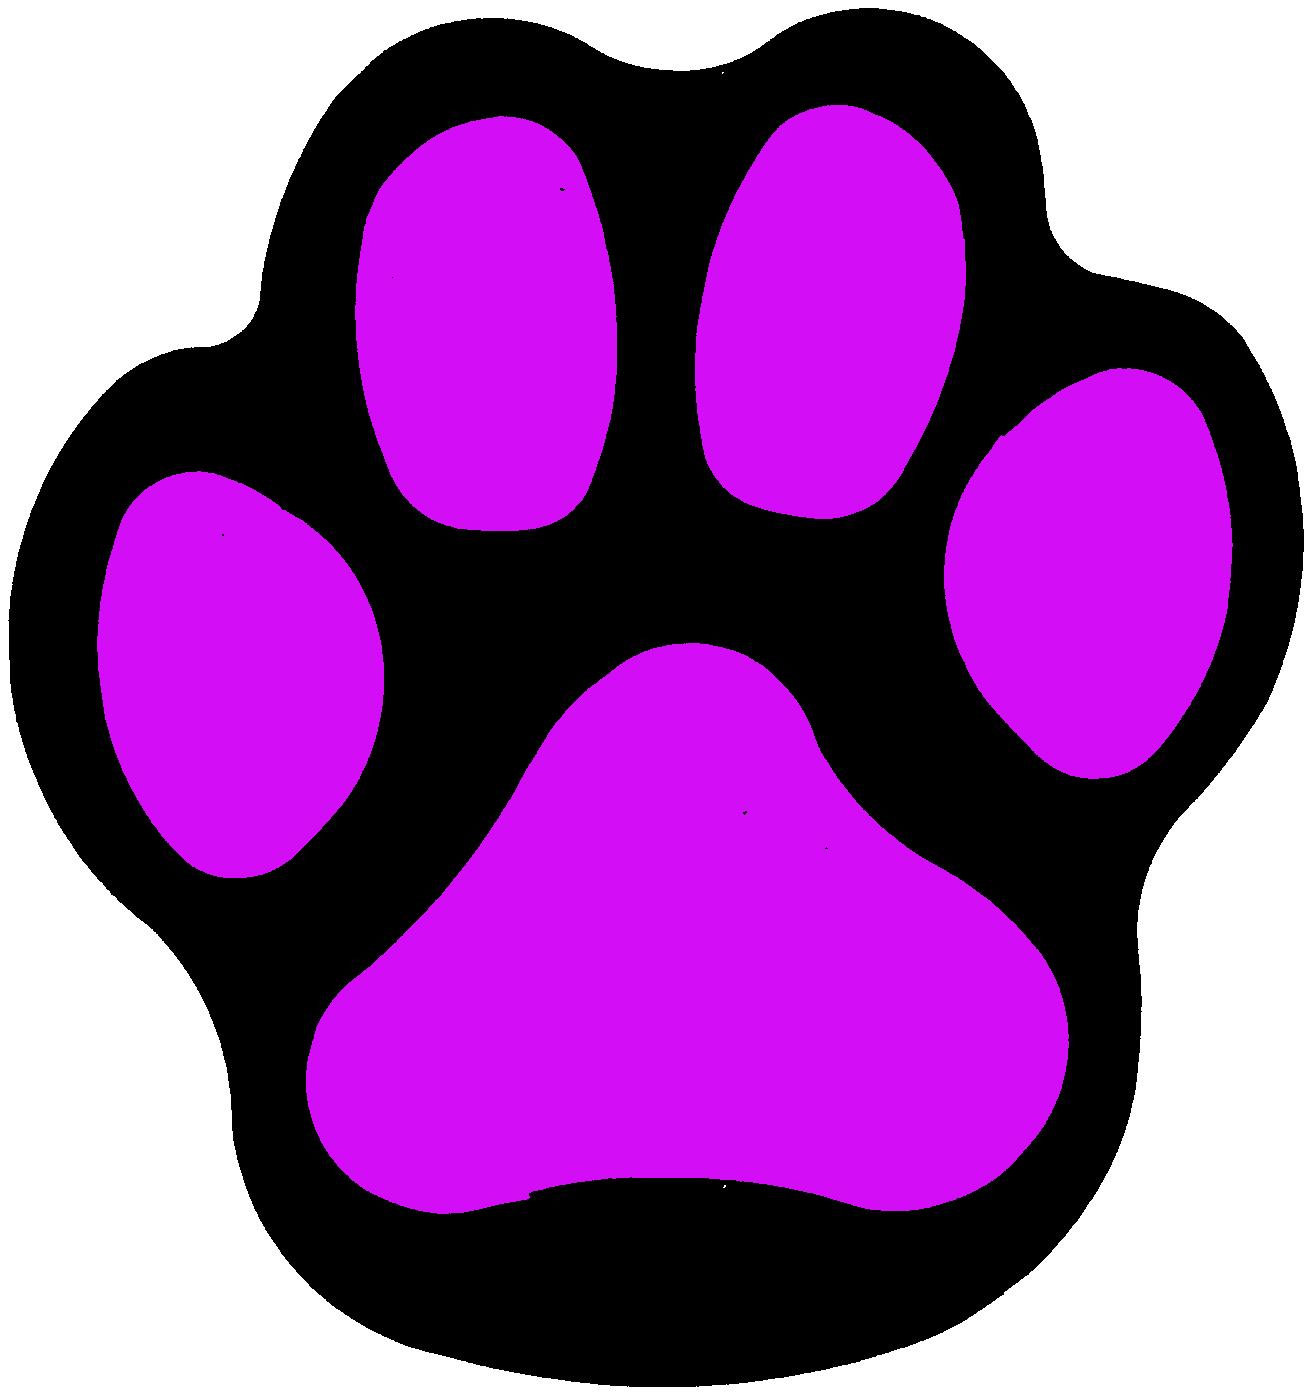 purple bobcat paw print clip art free image rh pixy org Wildcat Paw Print Clip Art Bobcat Paw Print Borders